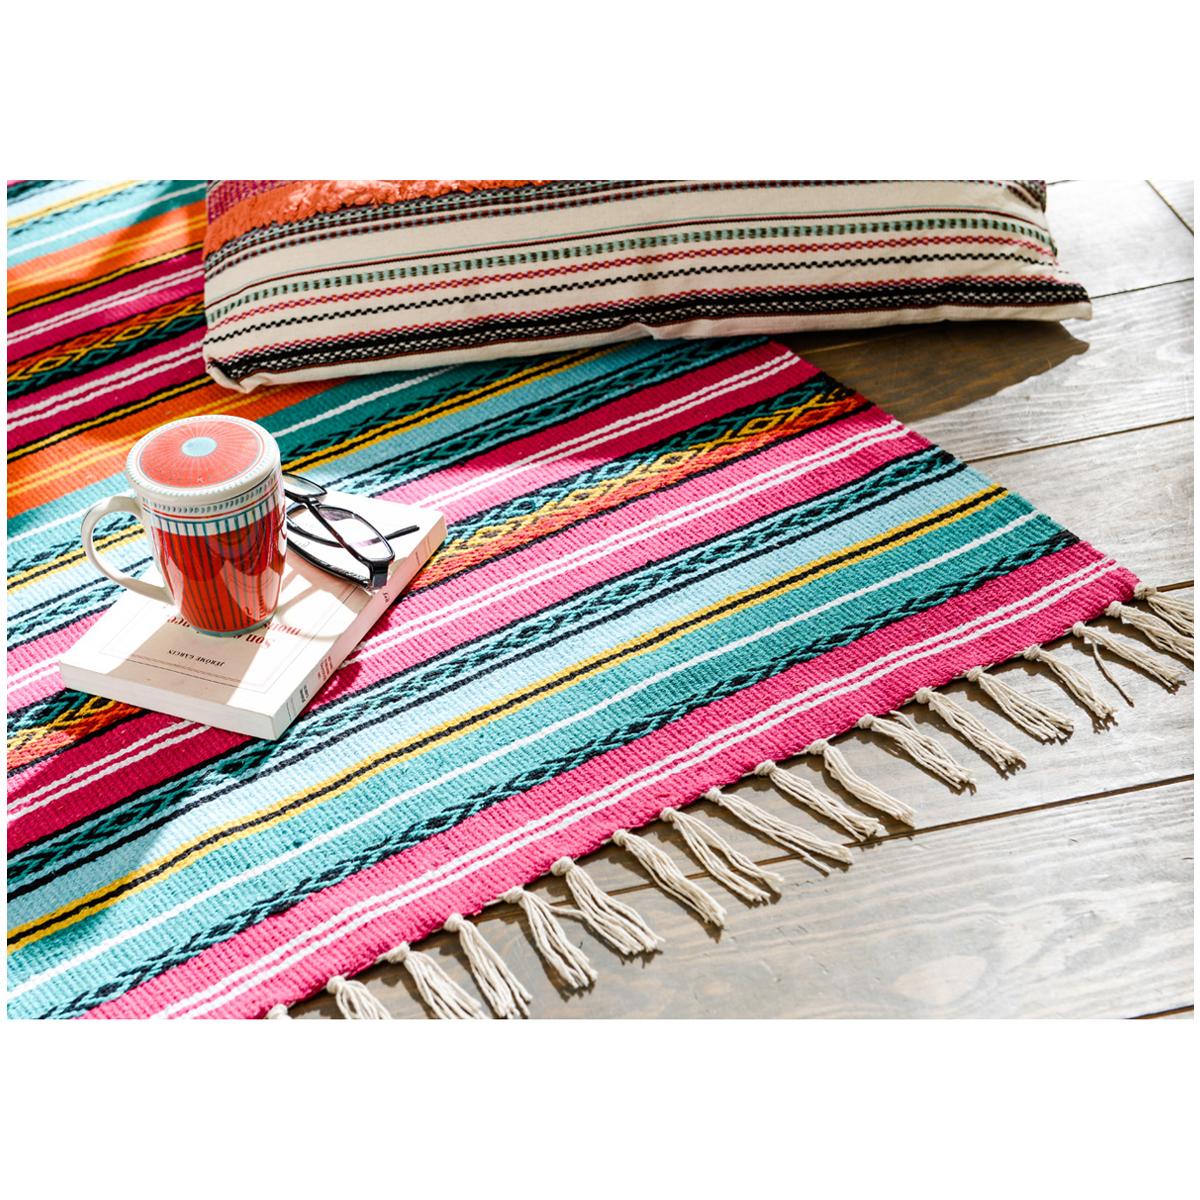 Tapis coton \'Boho\' multicolore - 120x80 cm - [Q9627]